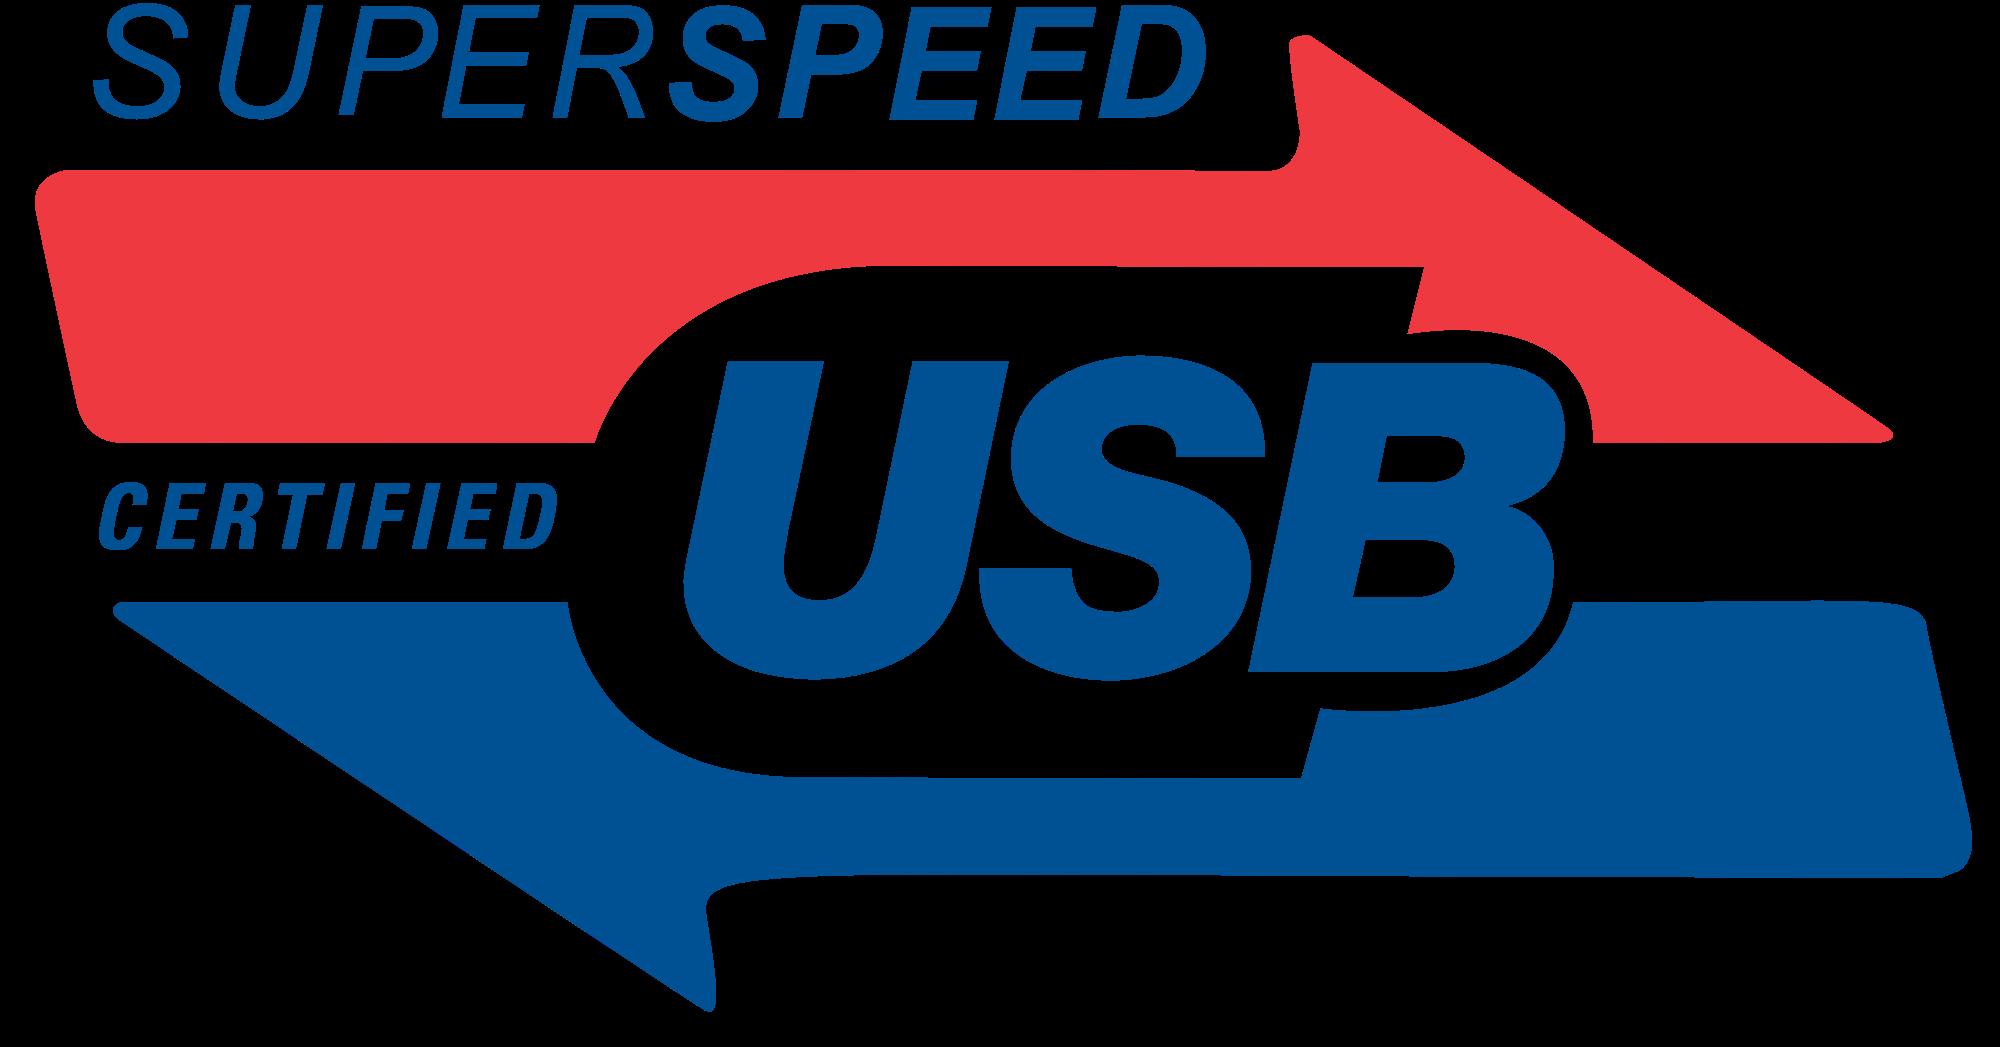 1223375-superspeed-usb-logo